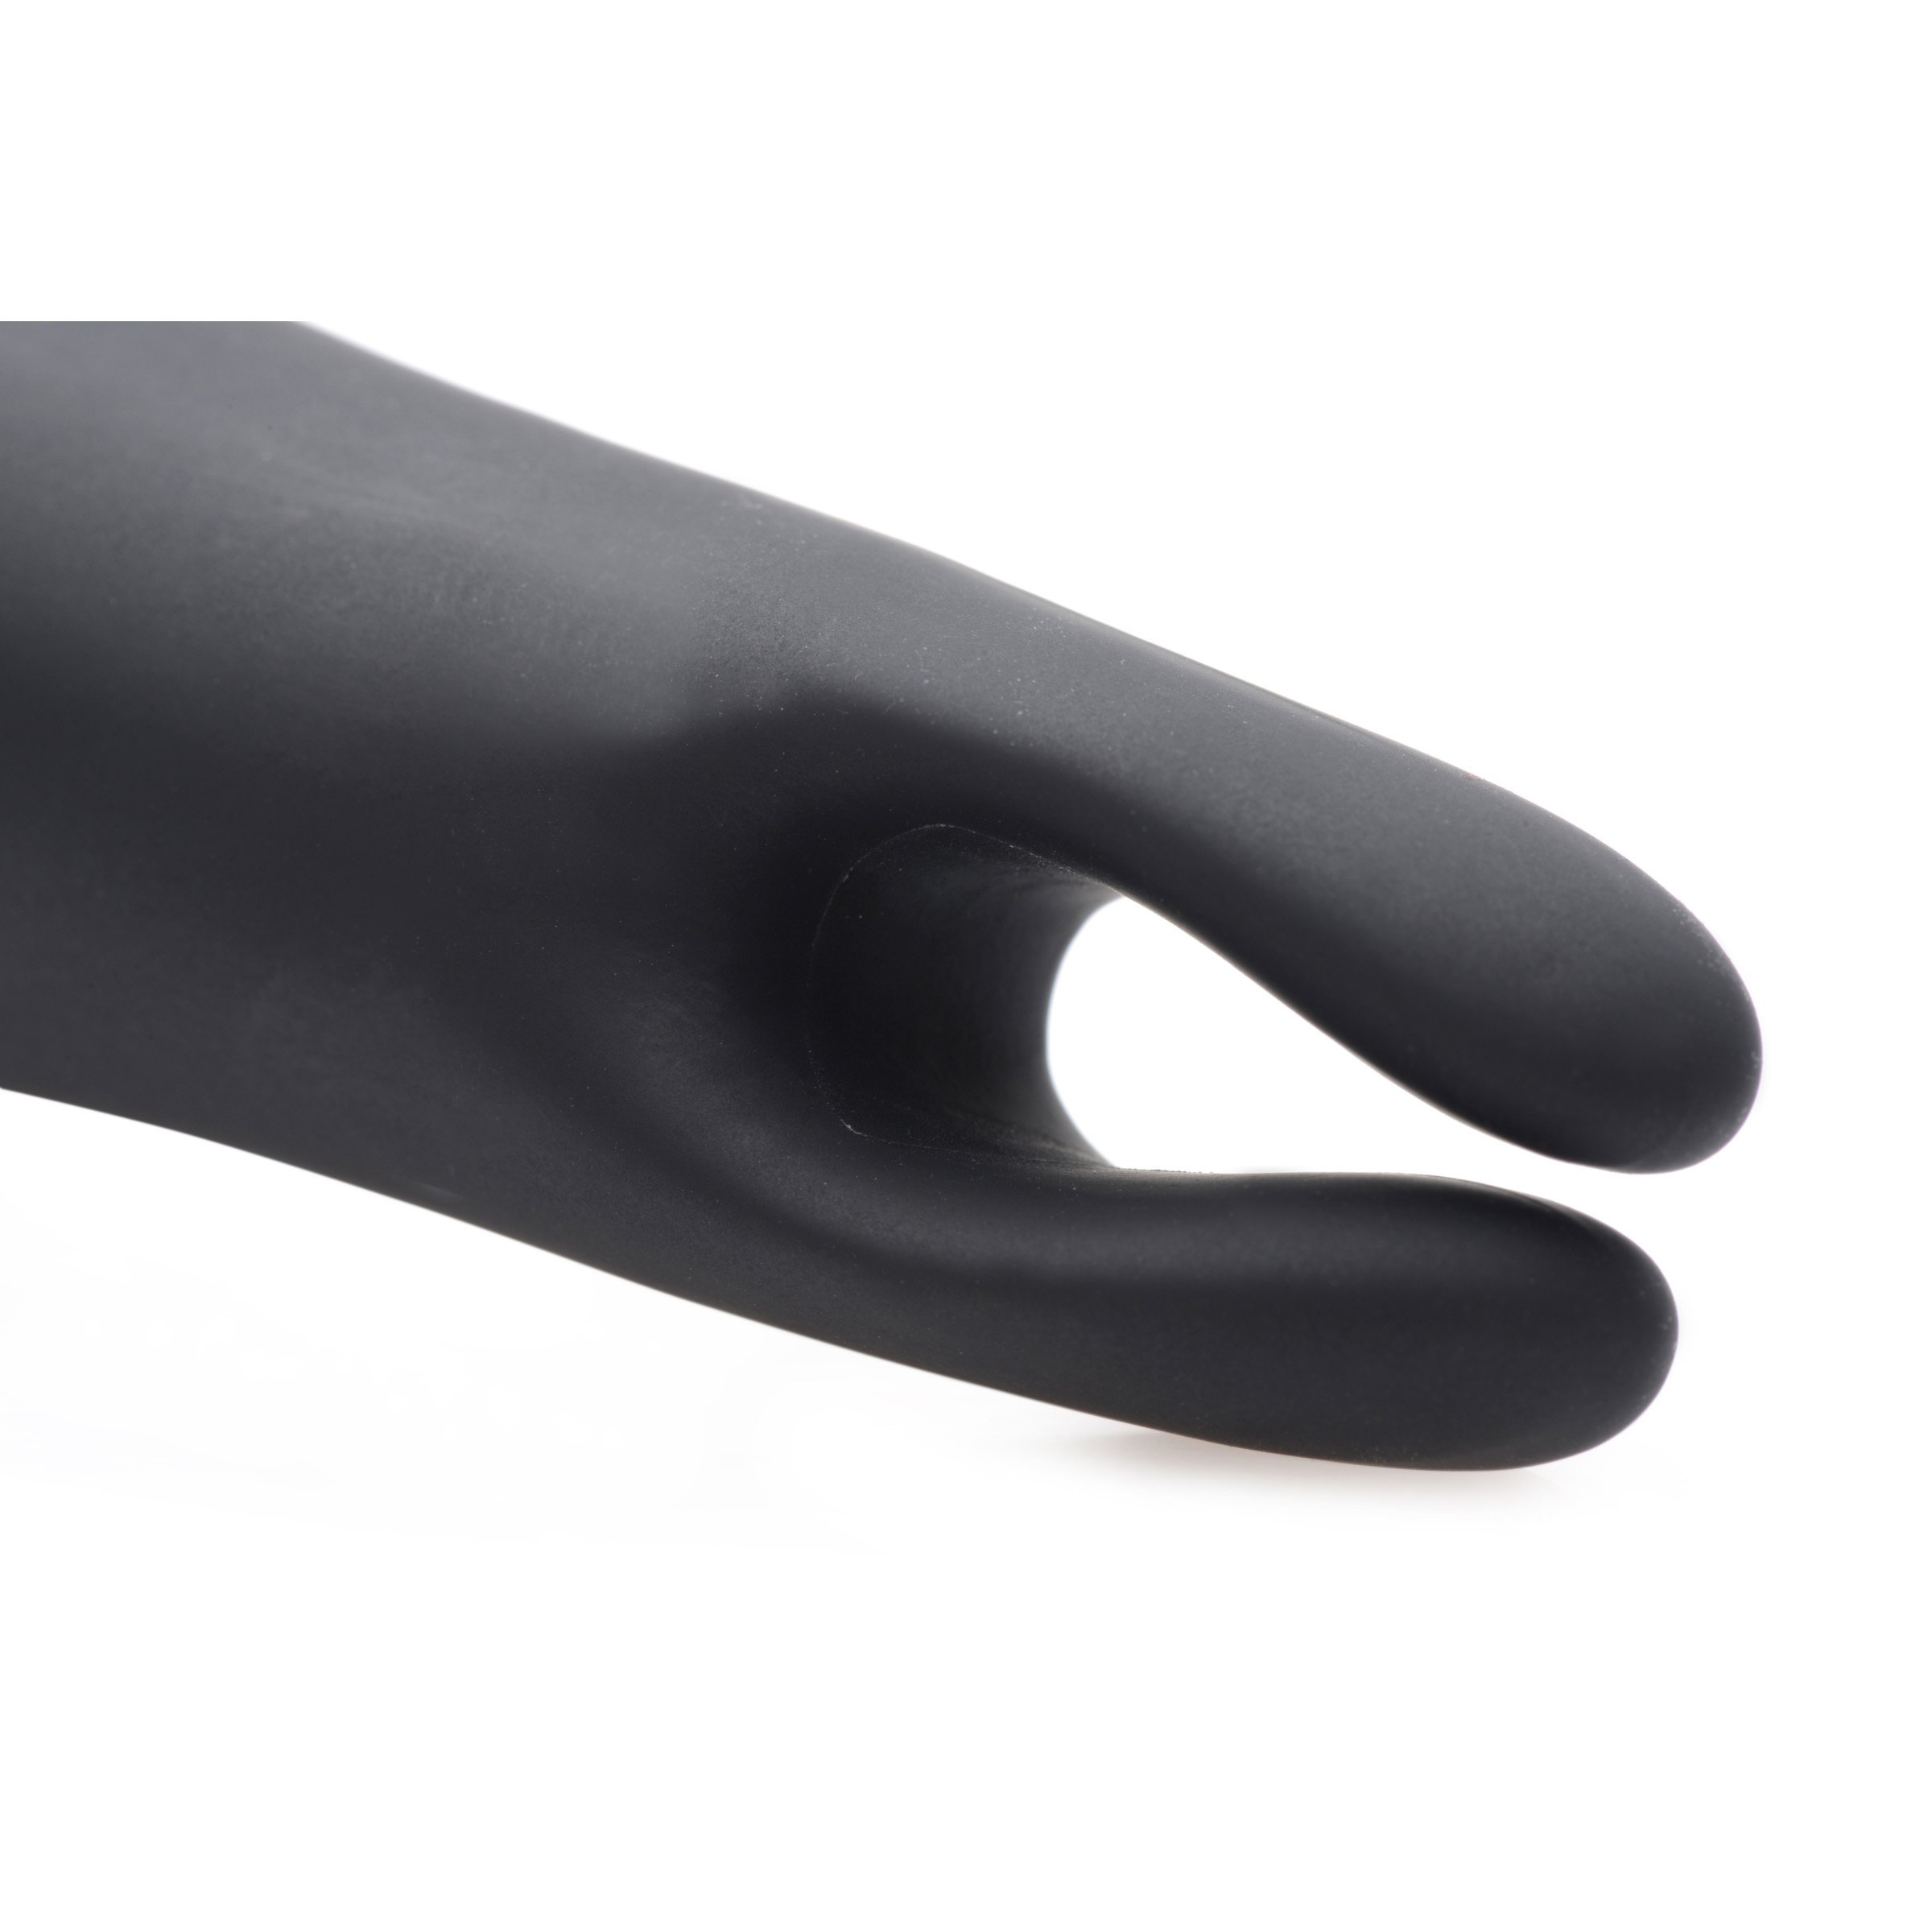 Dual Diva 2 in 1 Silicone Massager- Black